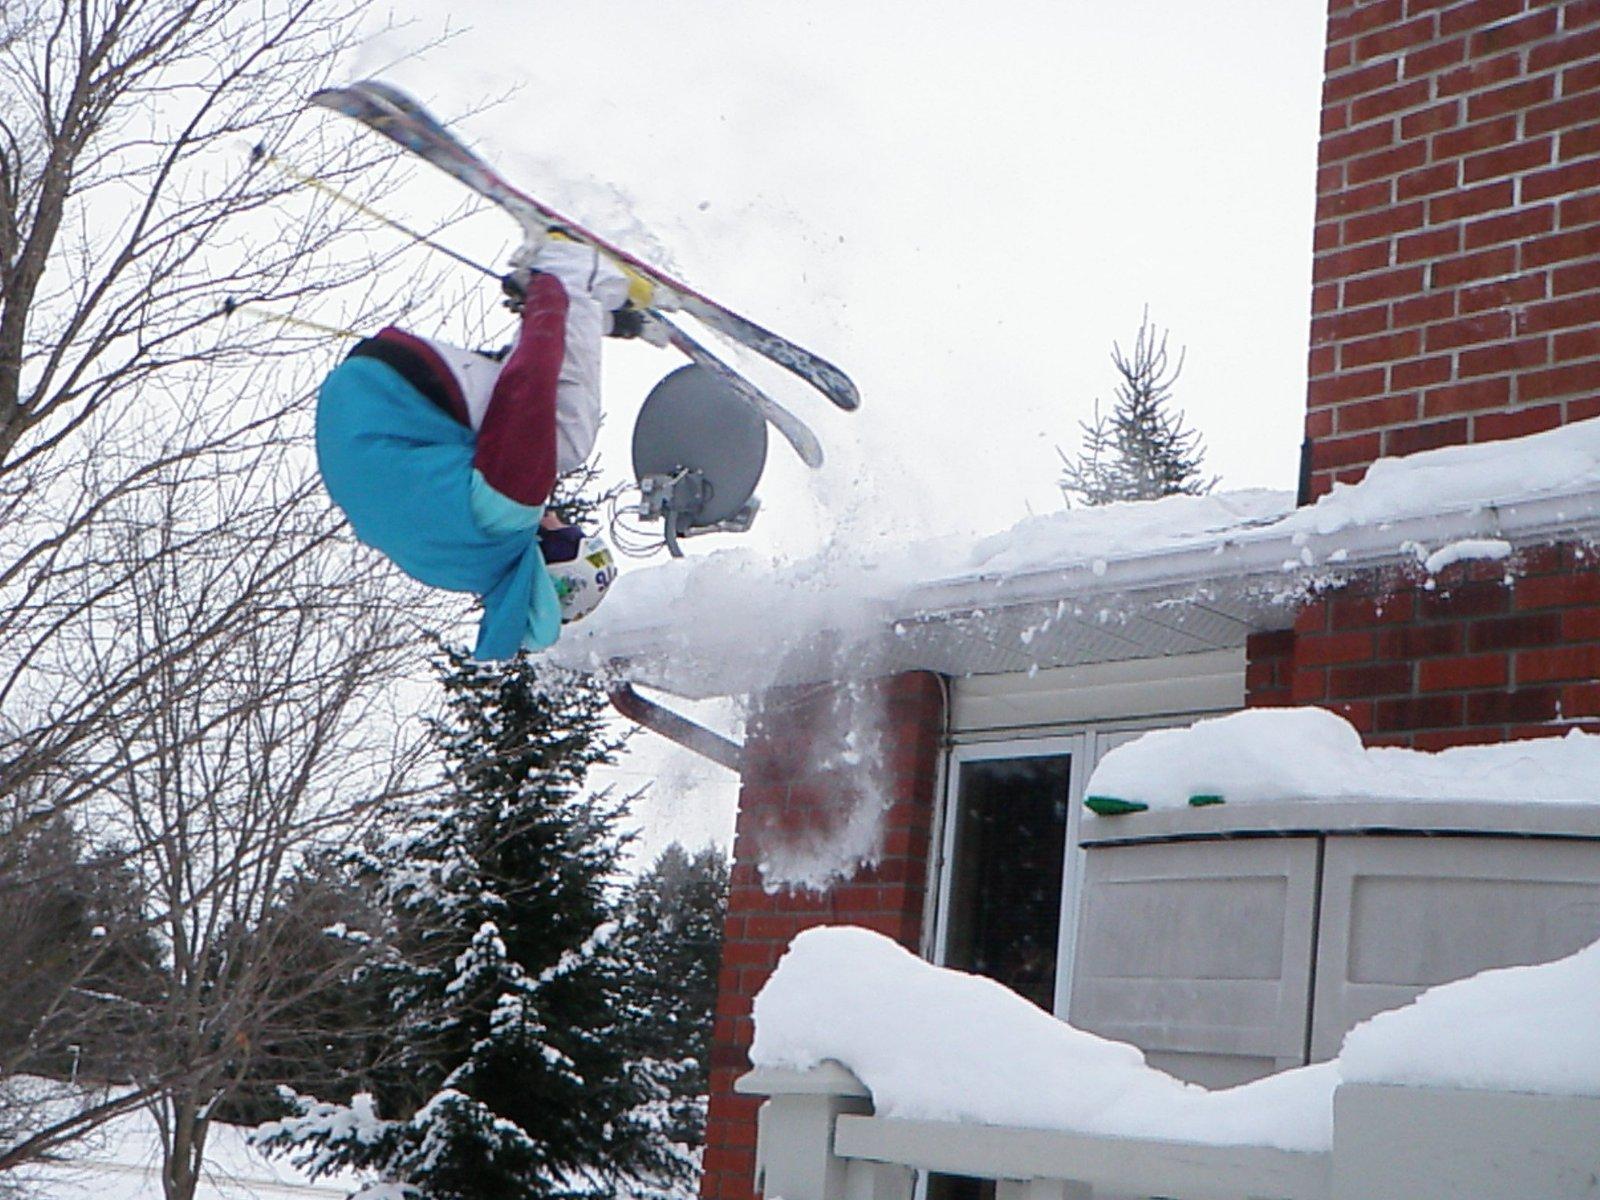 Roof Frontflip